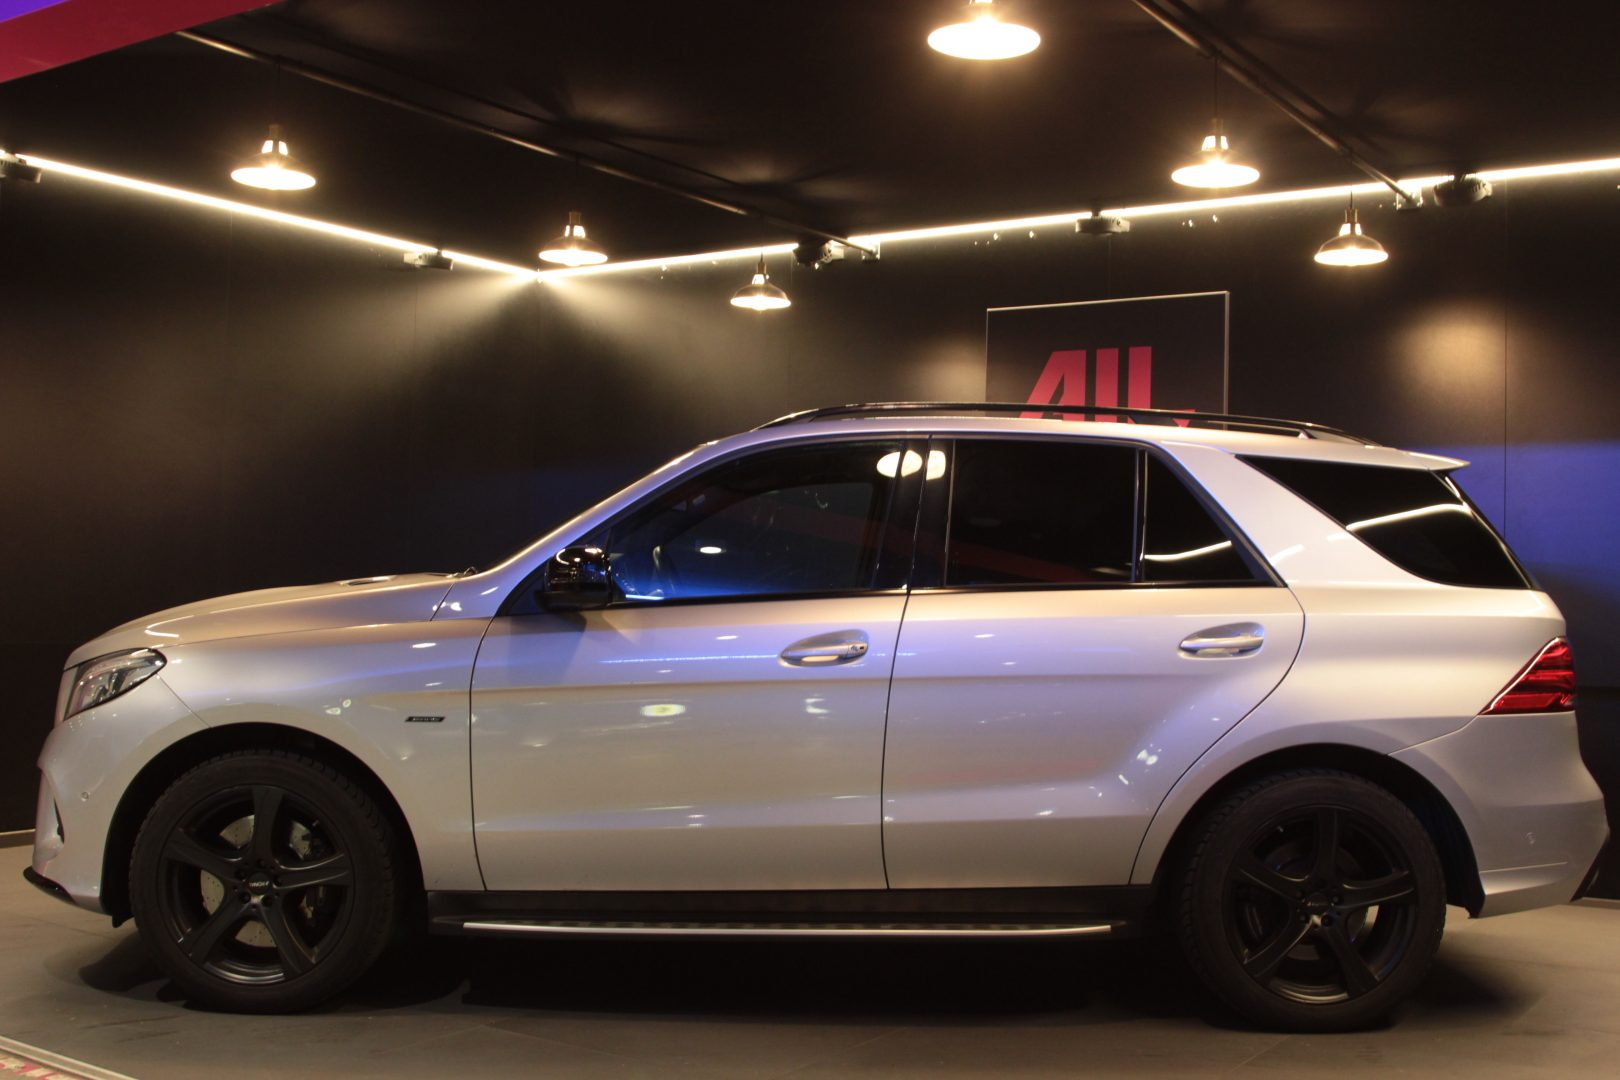 AIL Mercedes-Benz GLE 450 AMG 4Matic 6